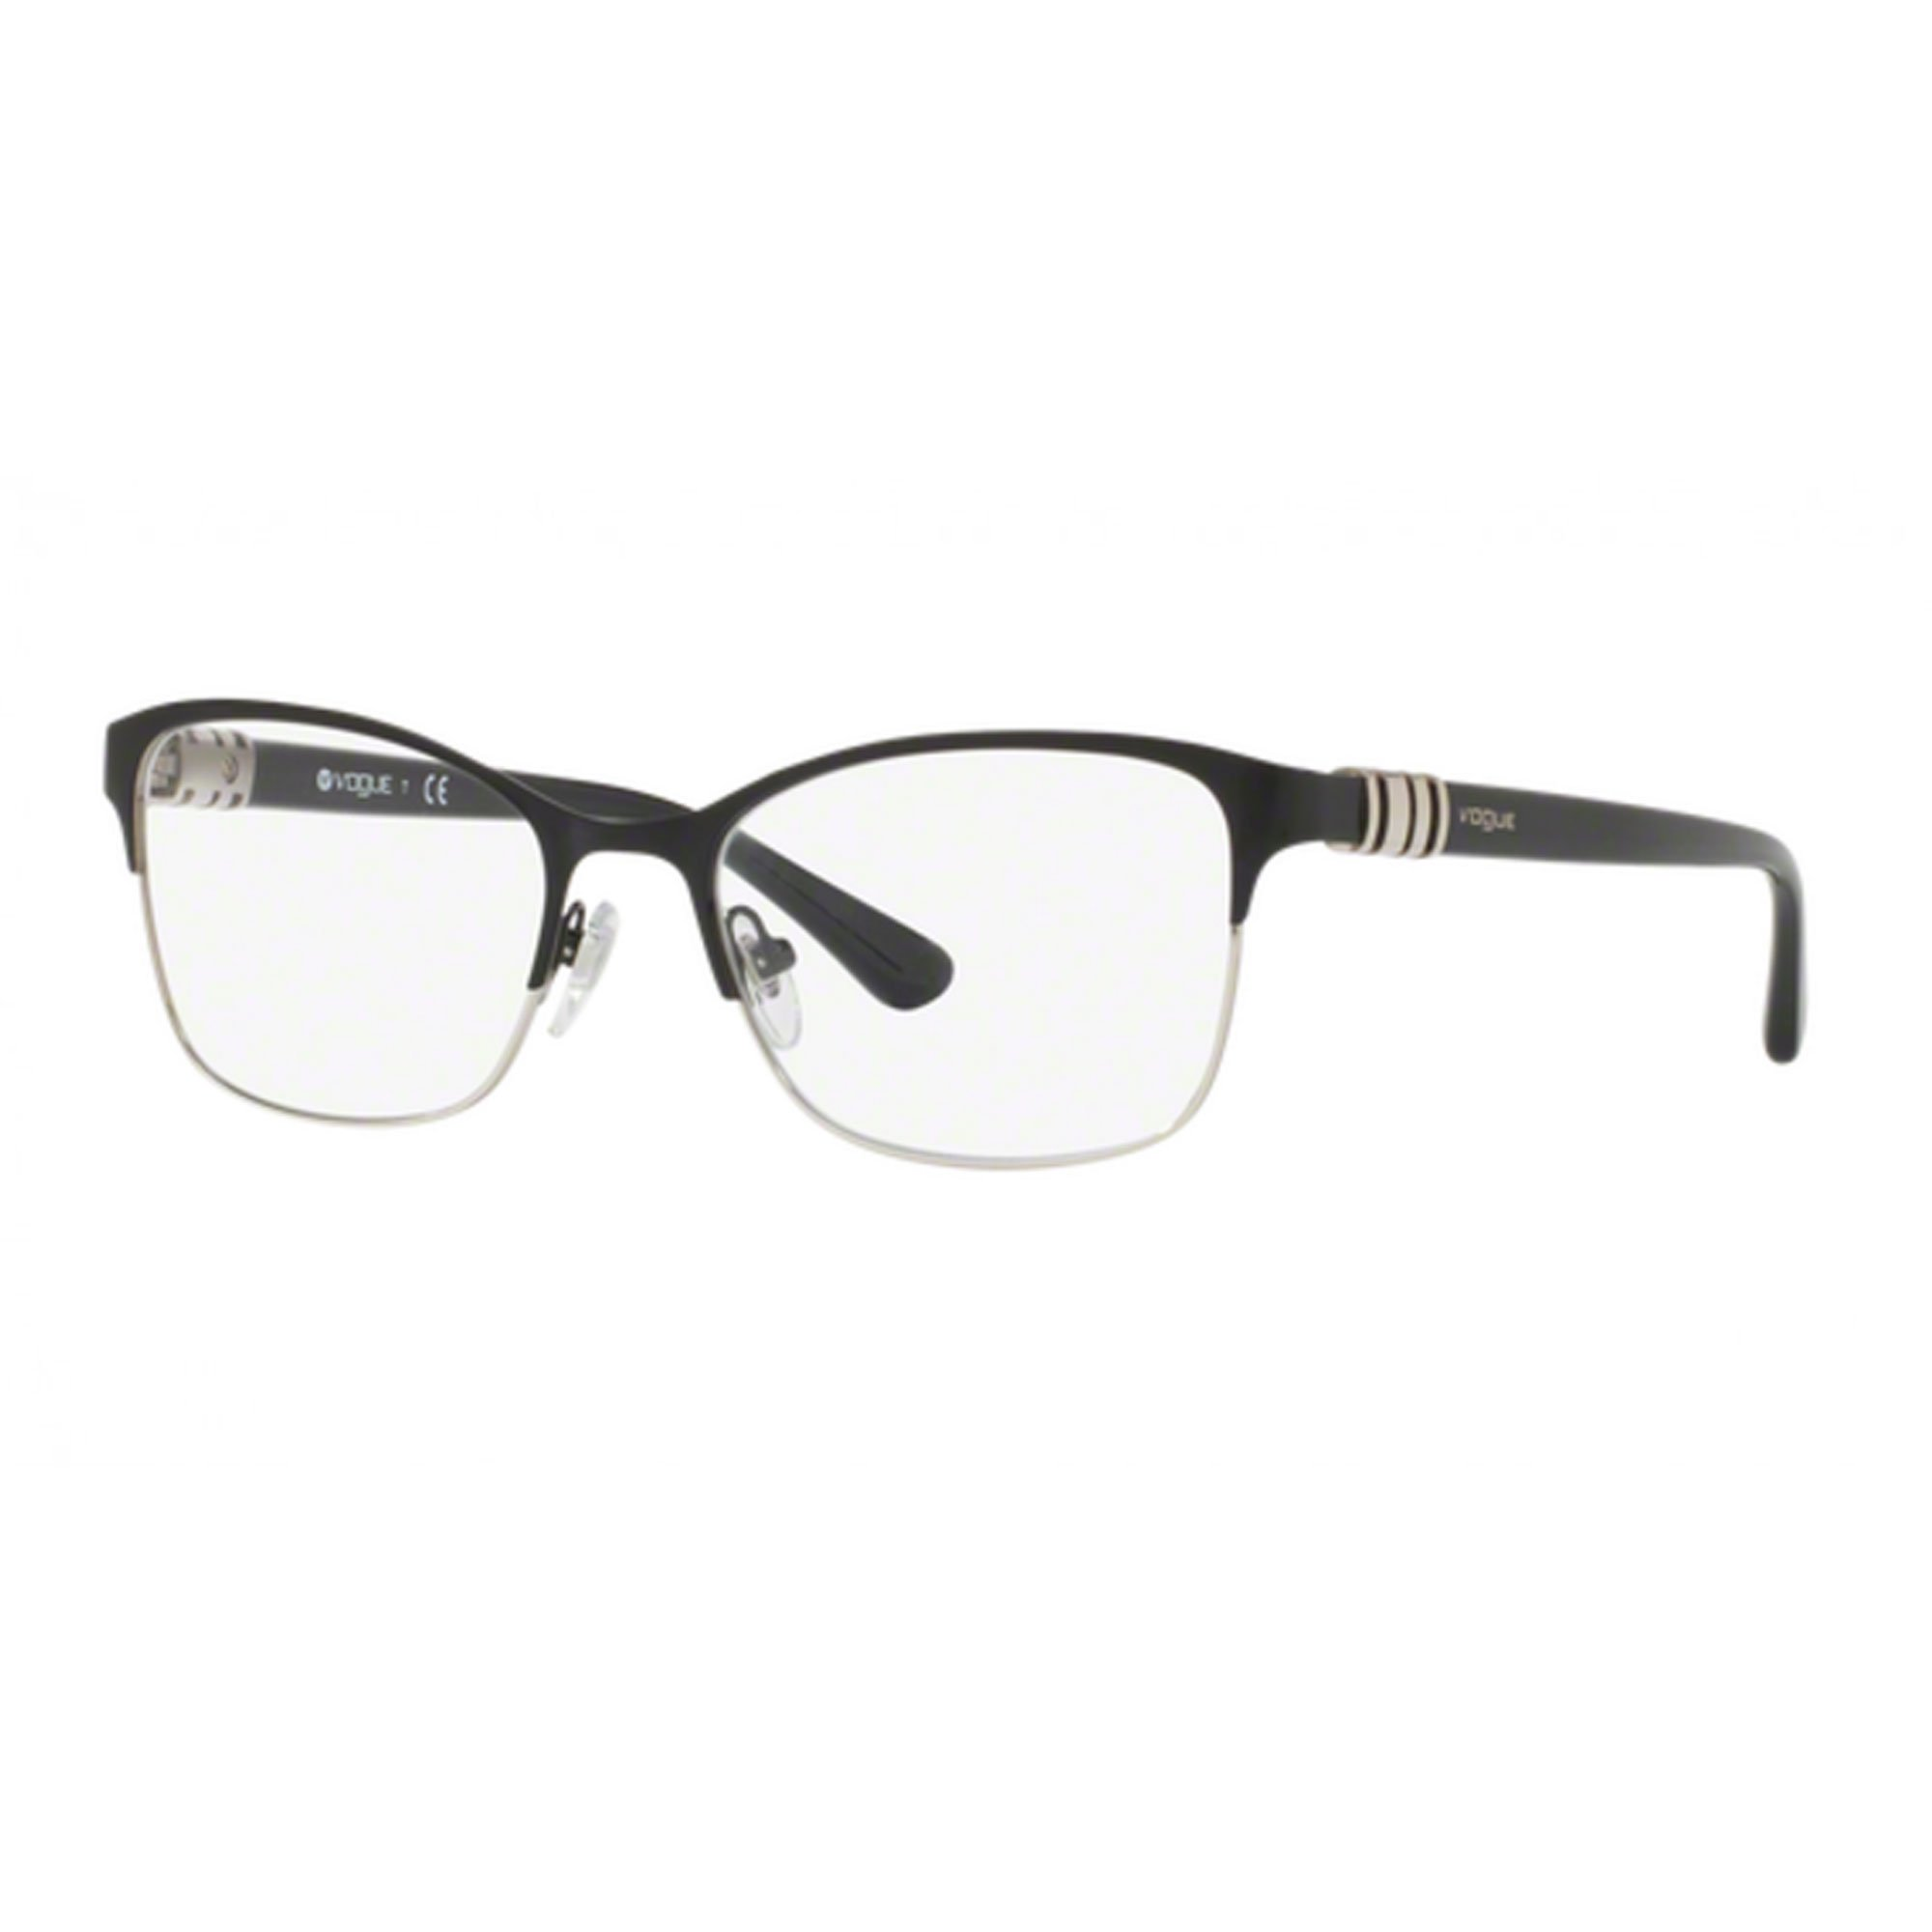 Soleggiato Vogue Vo4050 352 Cal.53 Occhiale Da Vista Nero Black Eyeglasses Sehbrille Donna Ultima Tecnologia